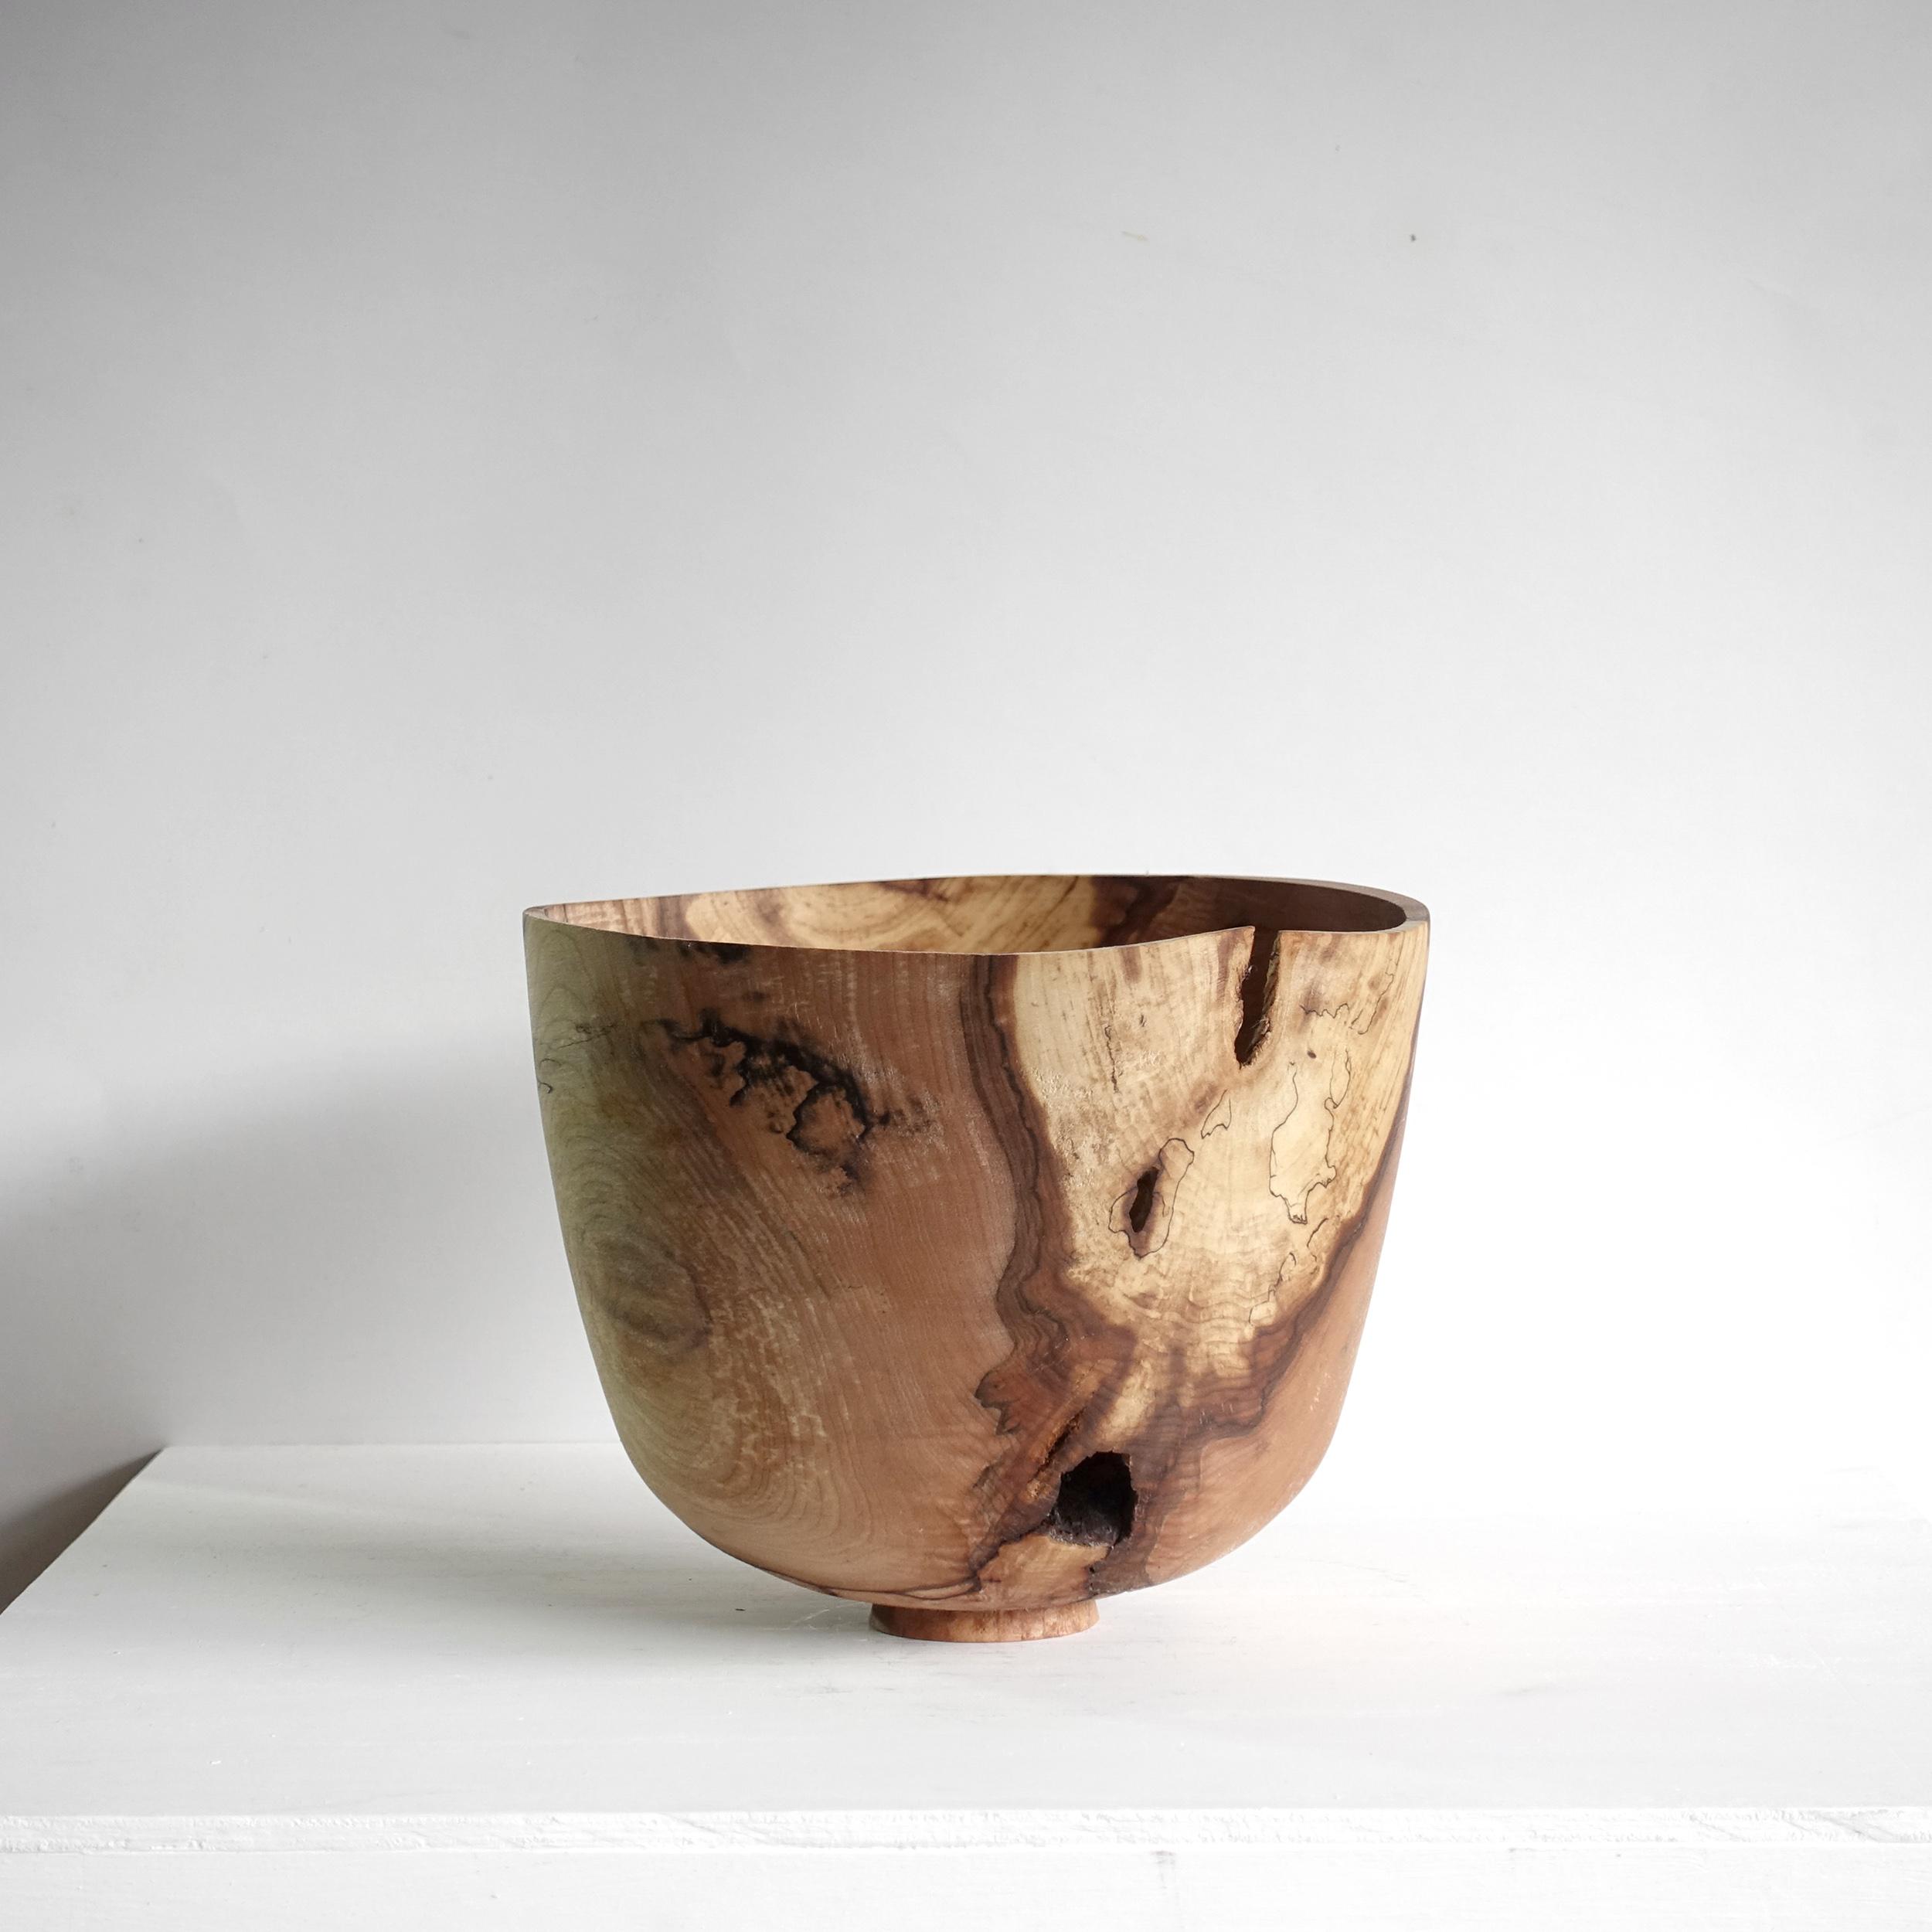 Spalted maple vessel / Bol en érable coti